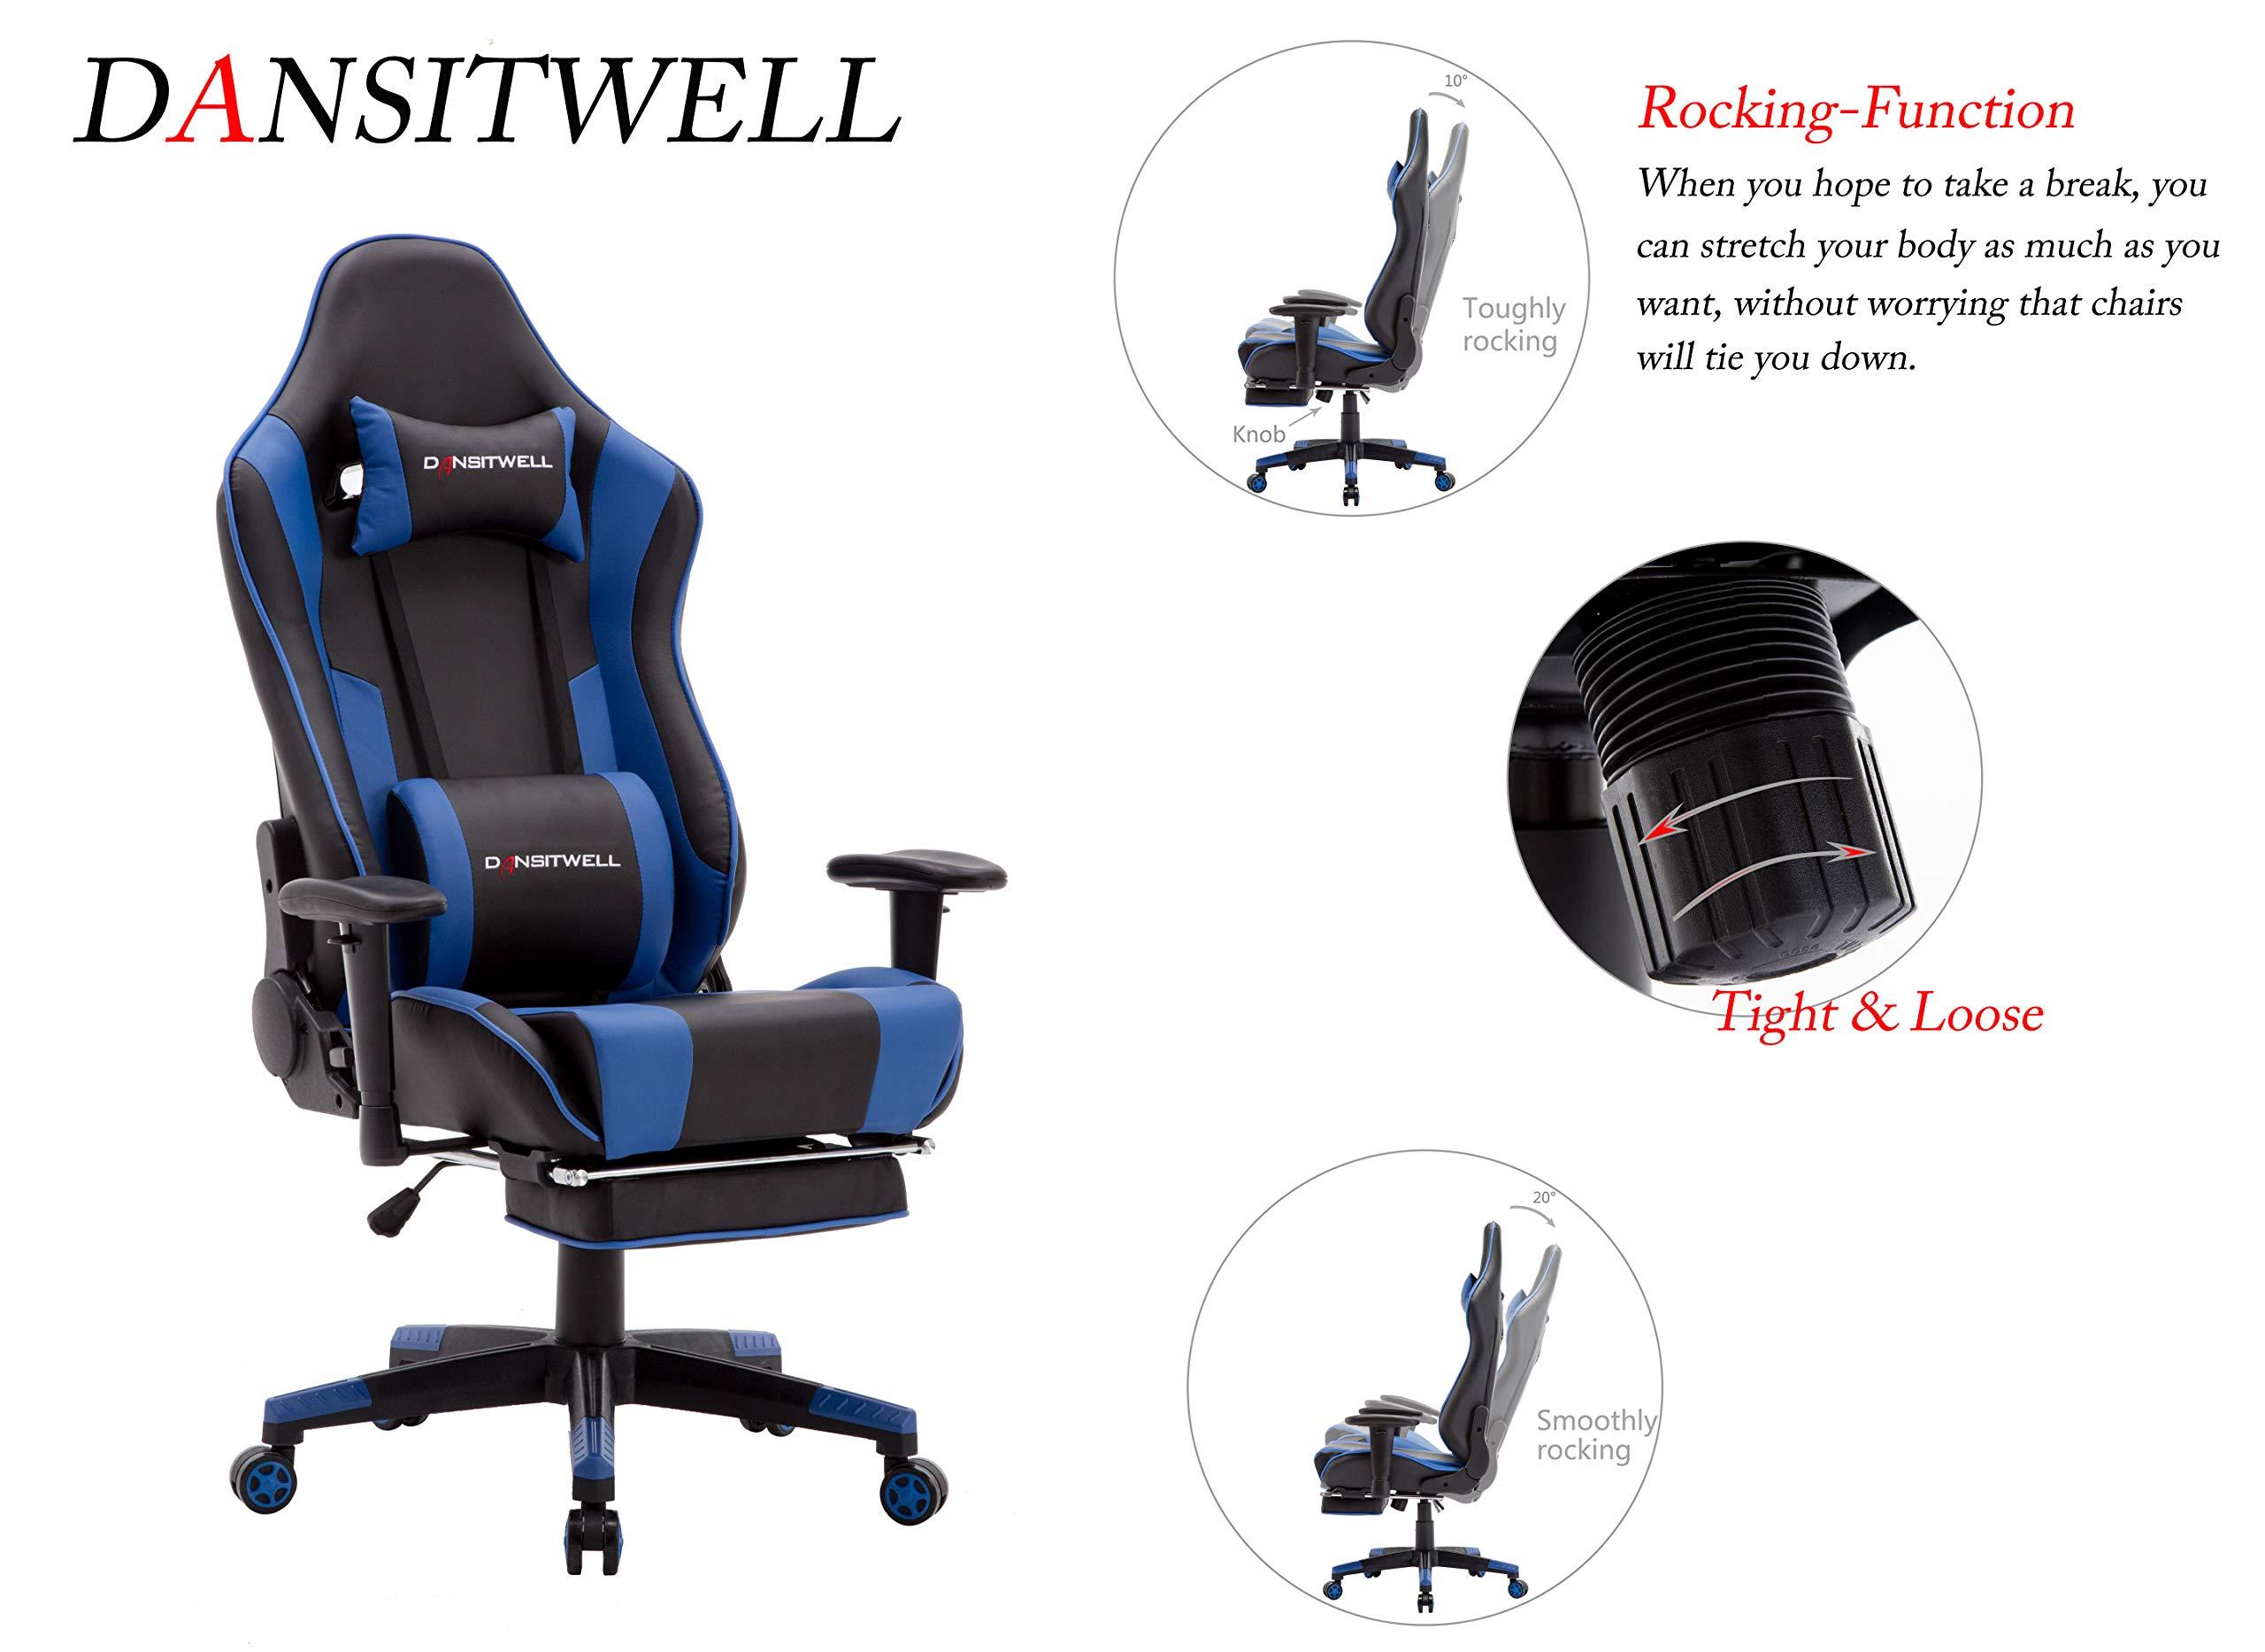 Swell Silla De Juego Dansitwell Con Reposapies Ergonomico Squirreltailoven Fun Painted Chair Ideas Images Squirreltailovenorg